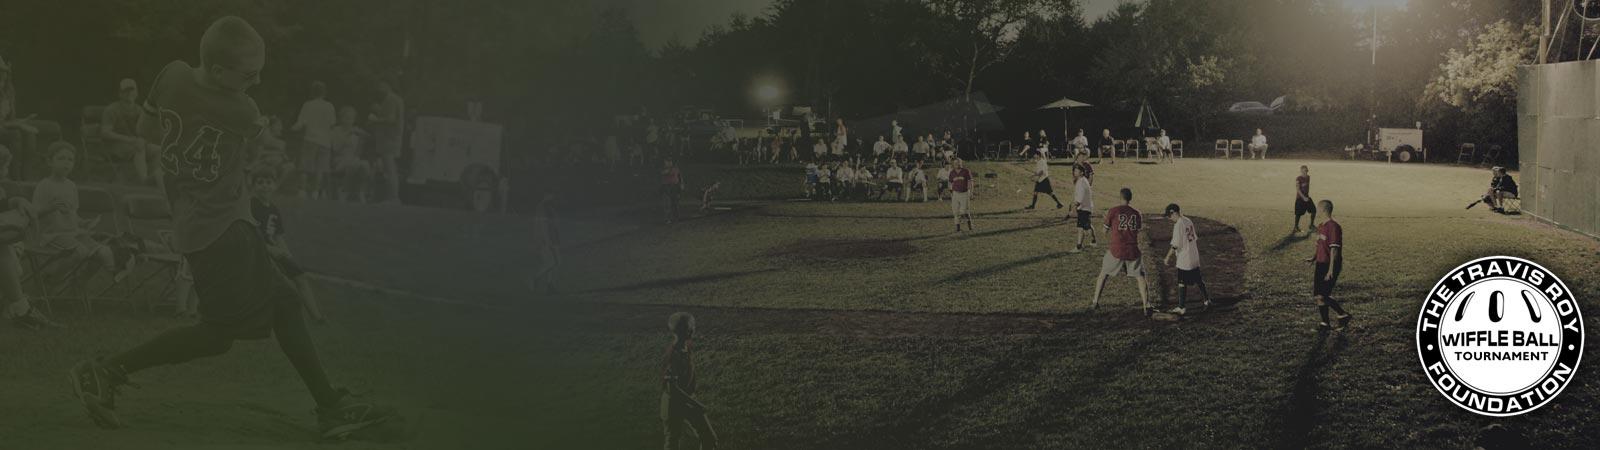 TRF WIFFLE Ball Tournament